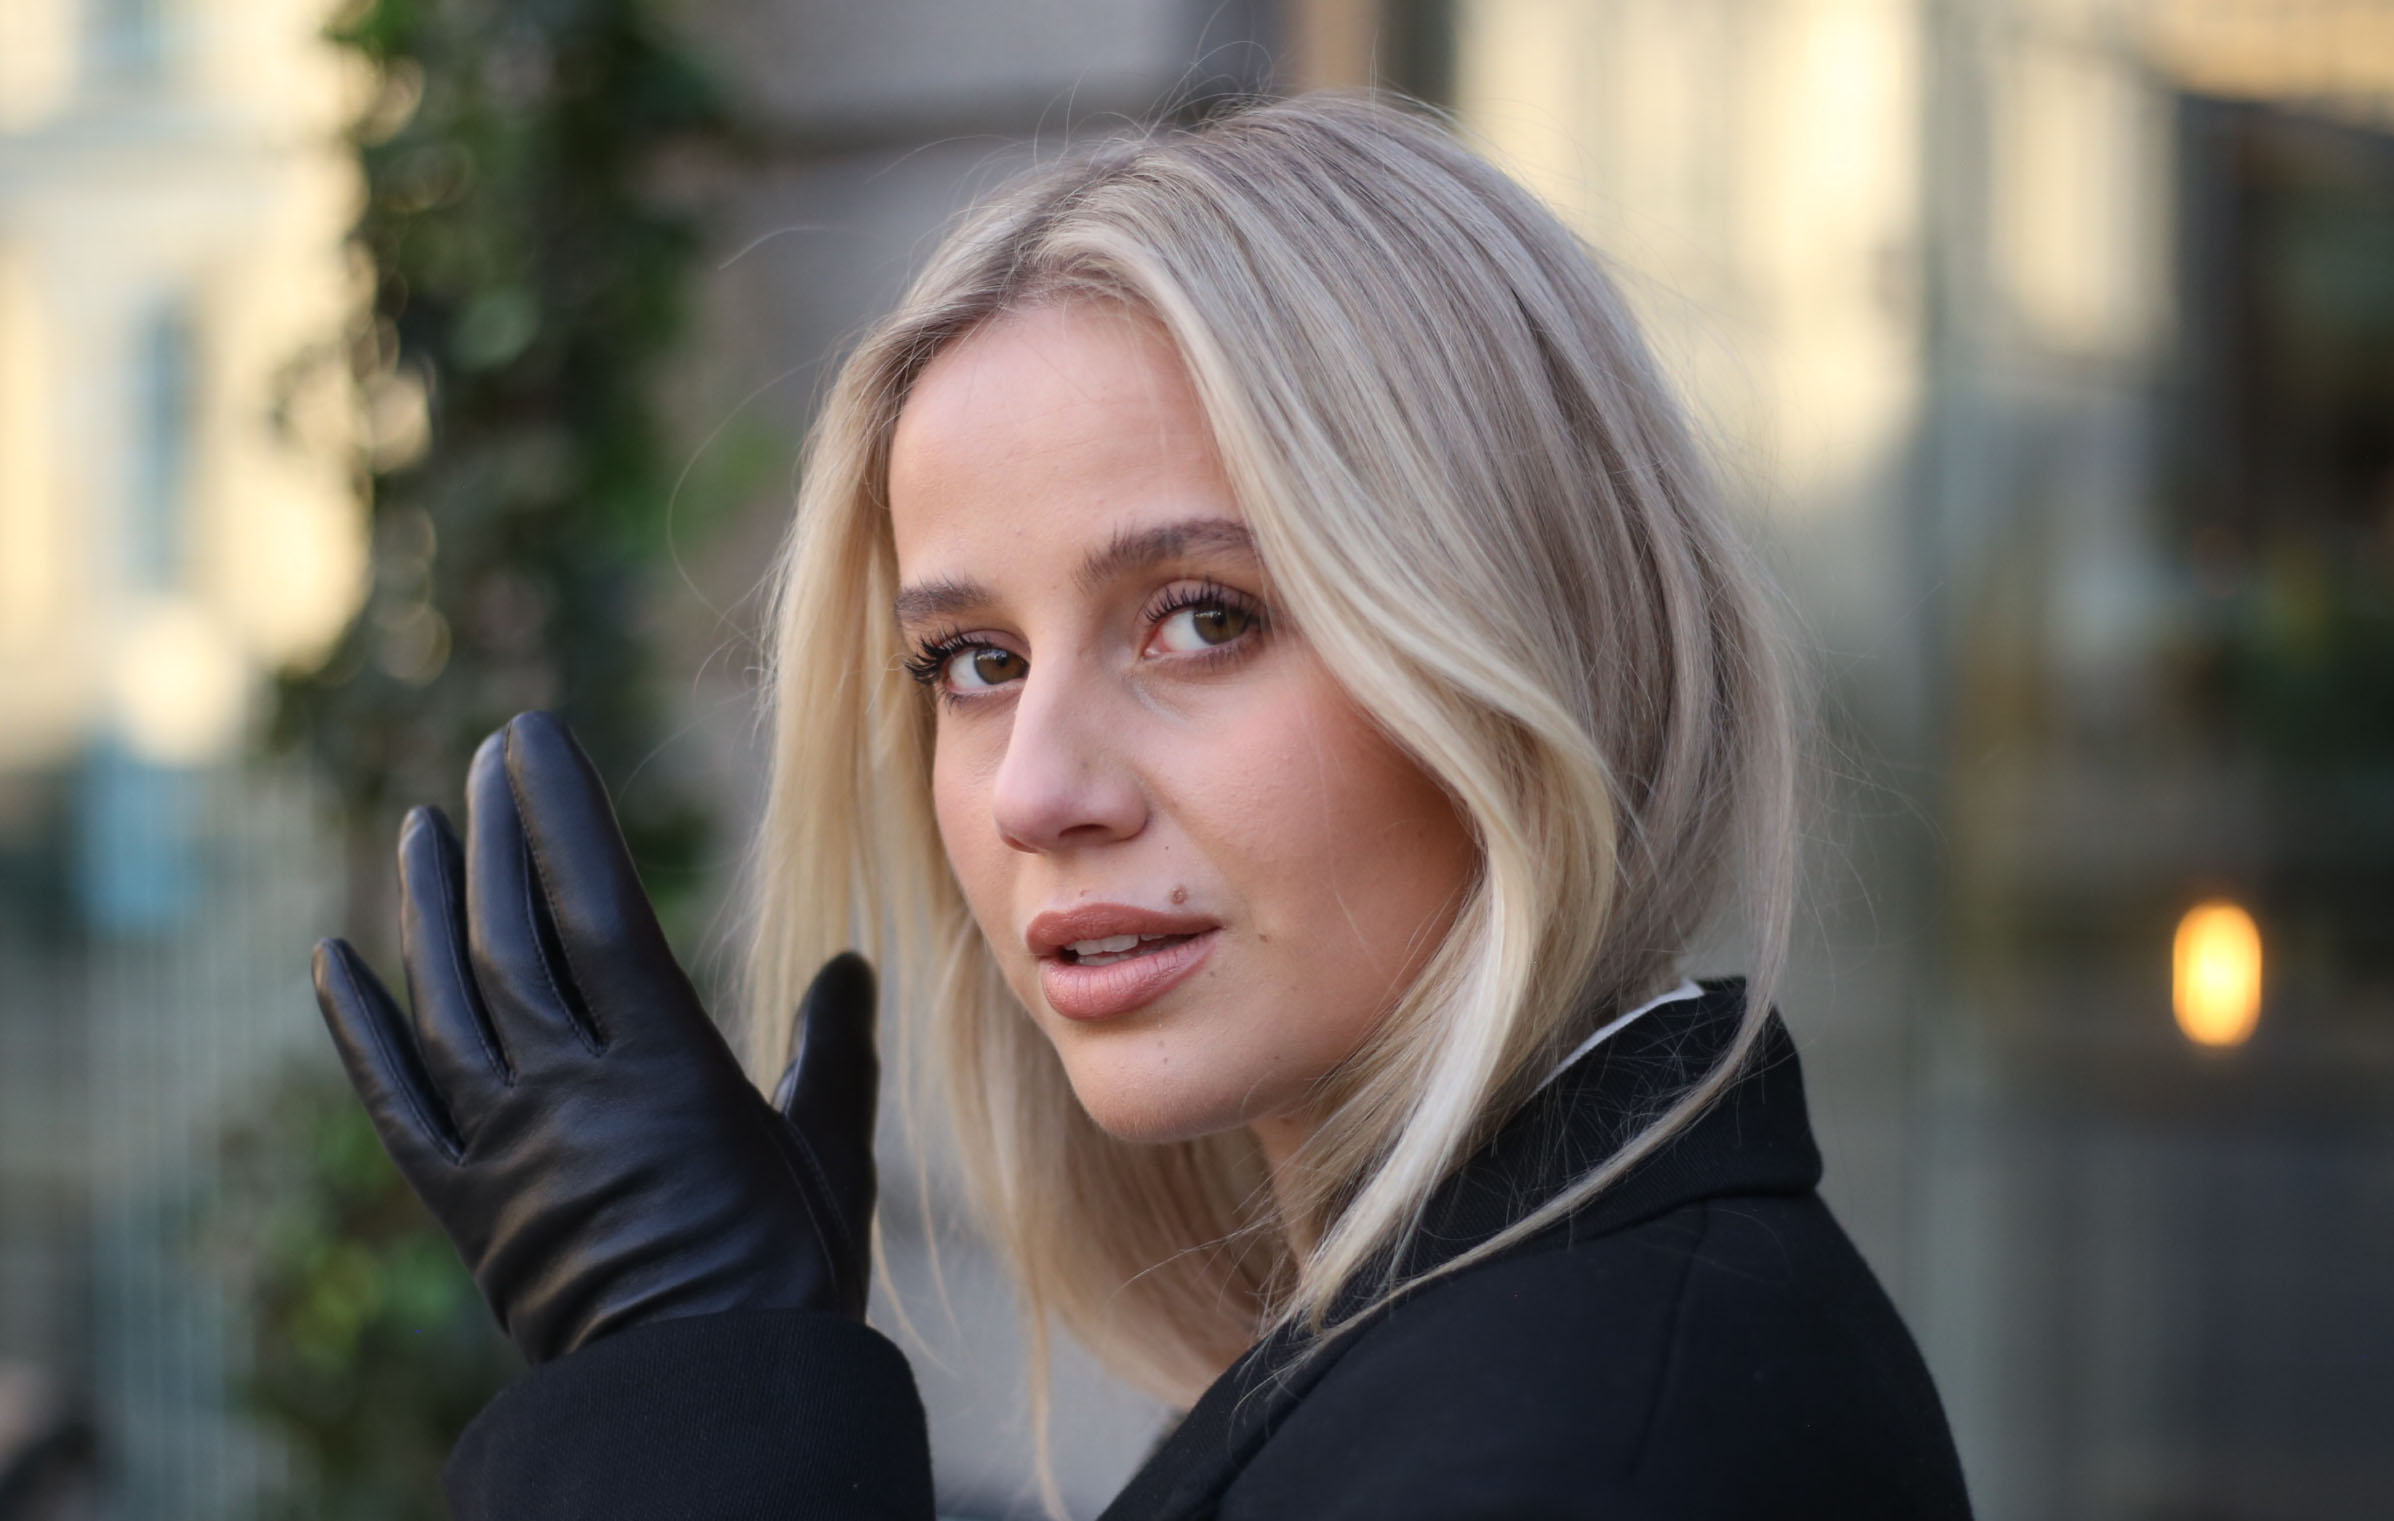 Anniken Englund Jørgensens andre bok er hennes første roman (Gyldendal/Anniken Jørgensen)